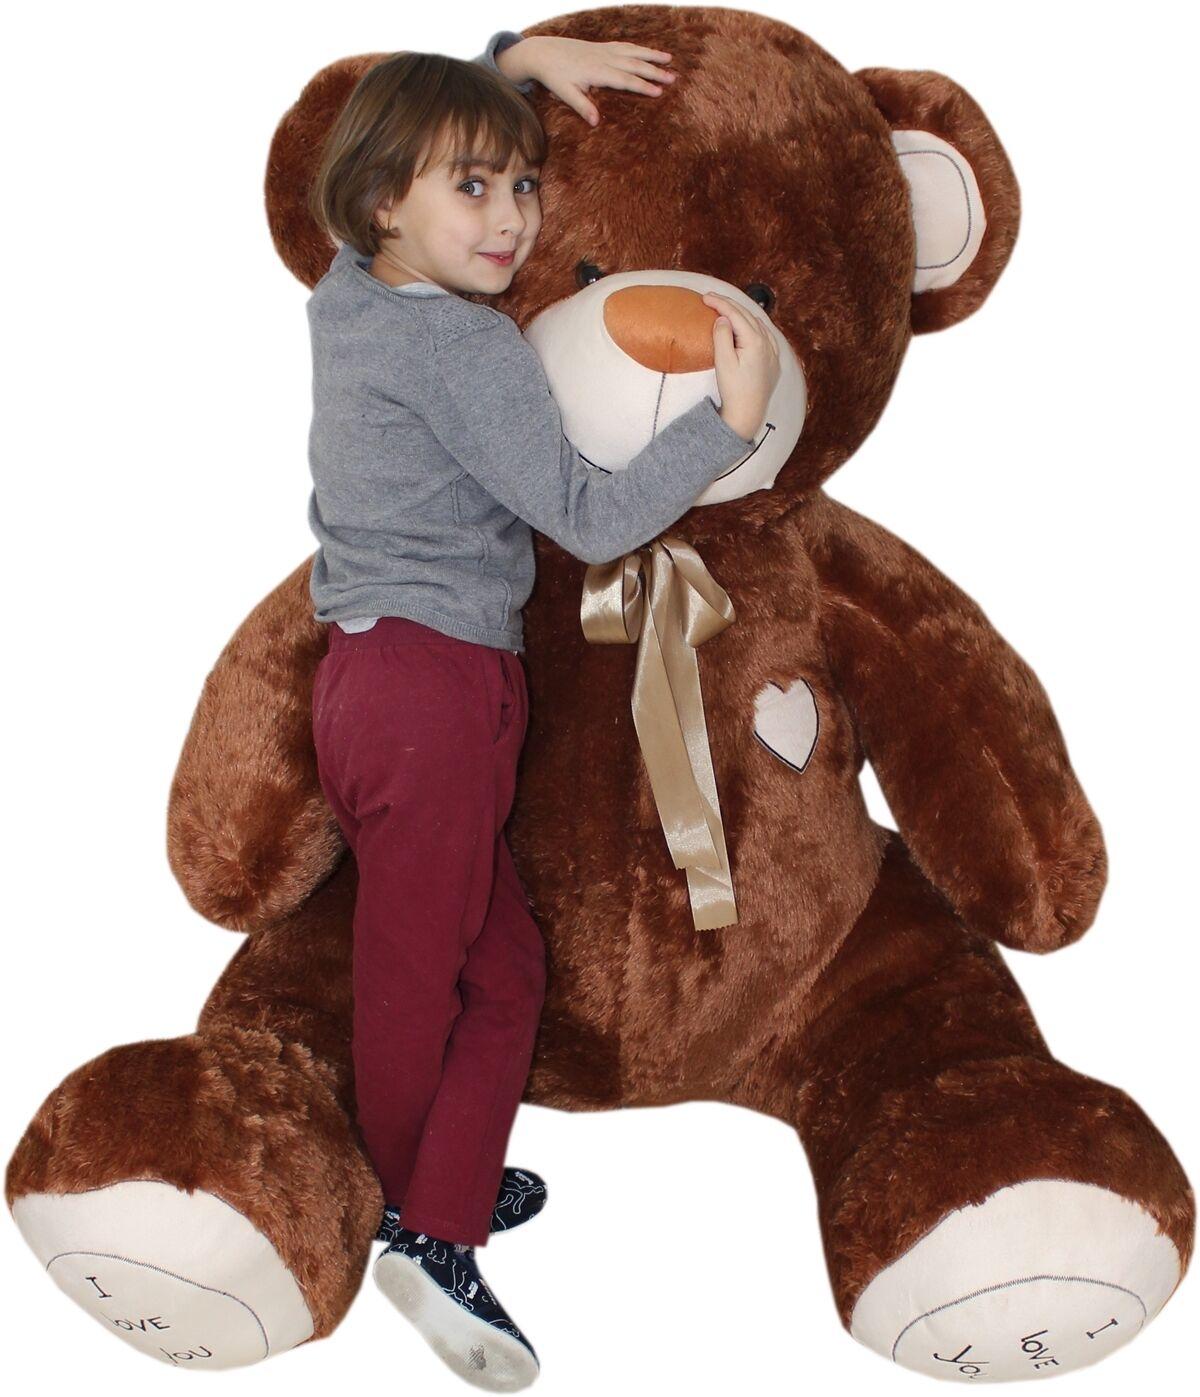 190 cm   GIANT LARGE BIG HUGE TEDDY BEAR +EMBROIDERY  braun BEIGE Weiß ECRU